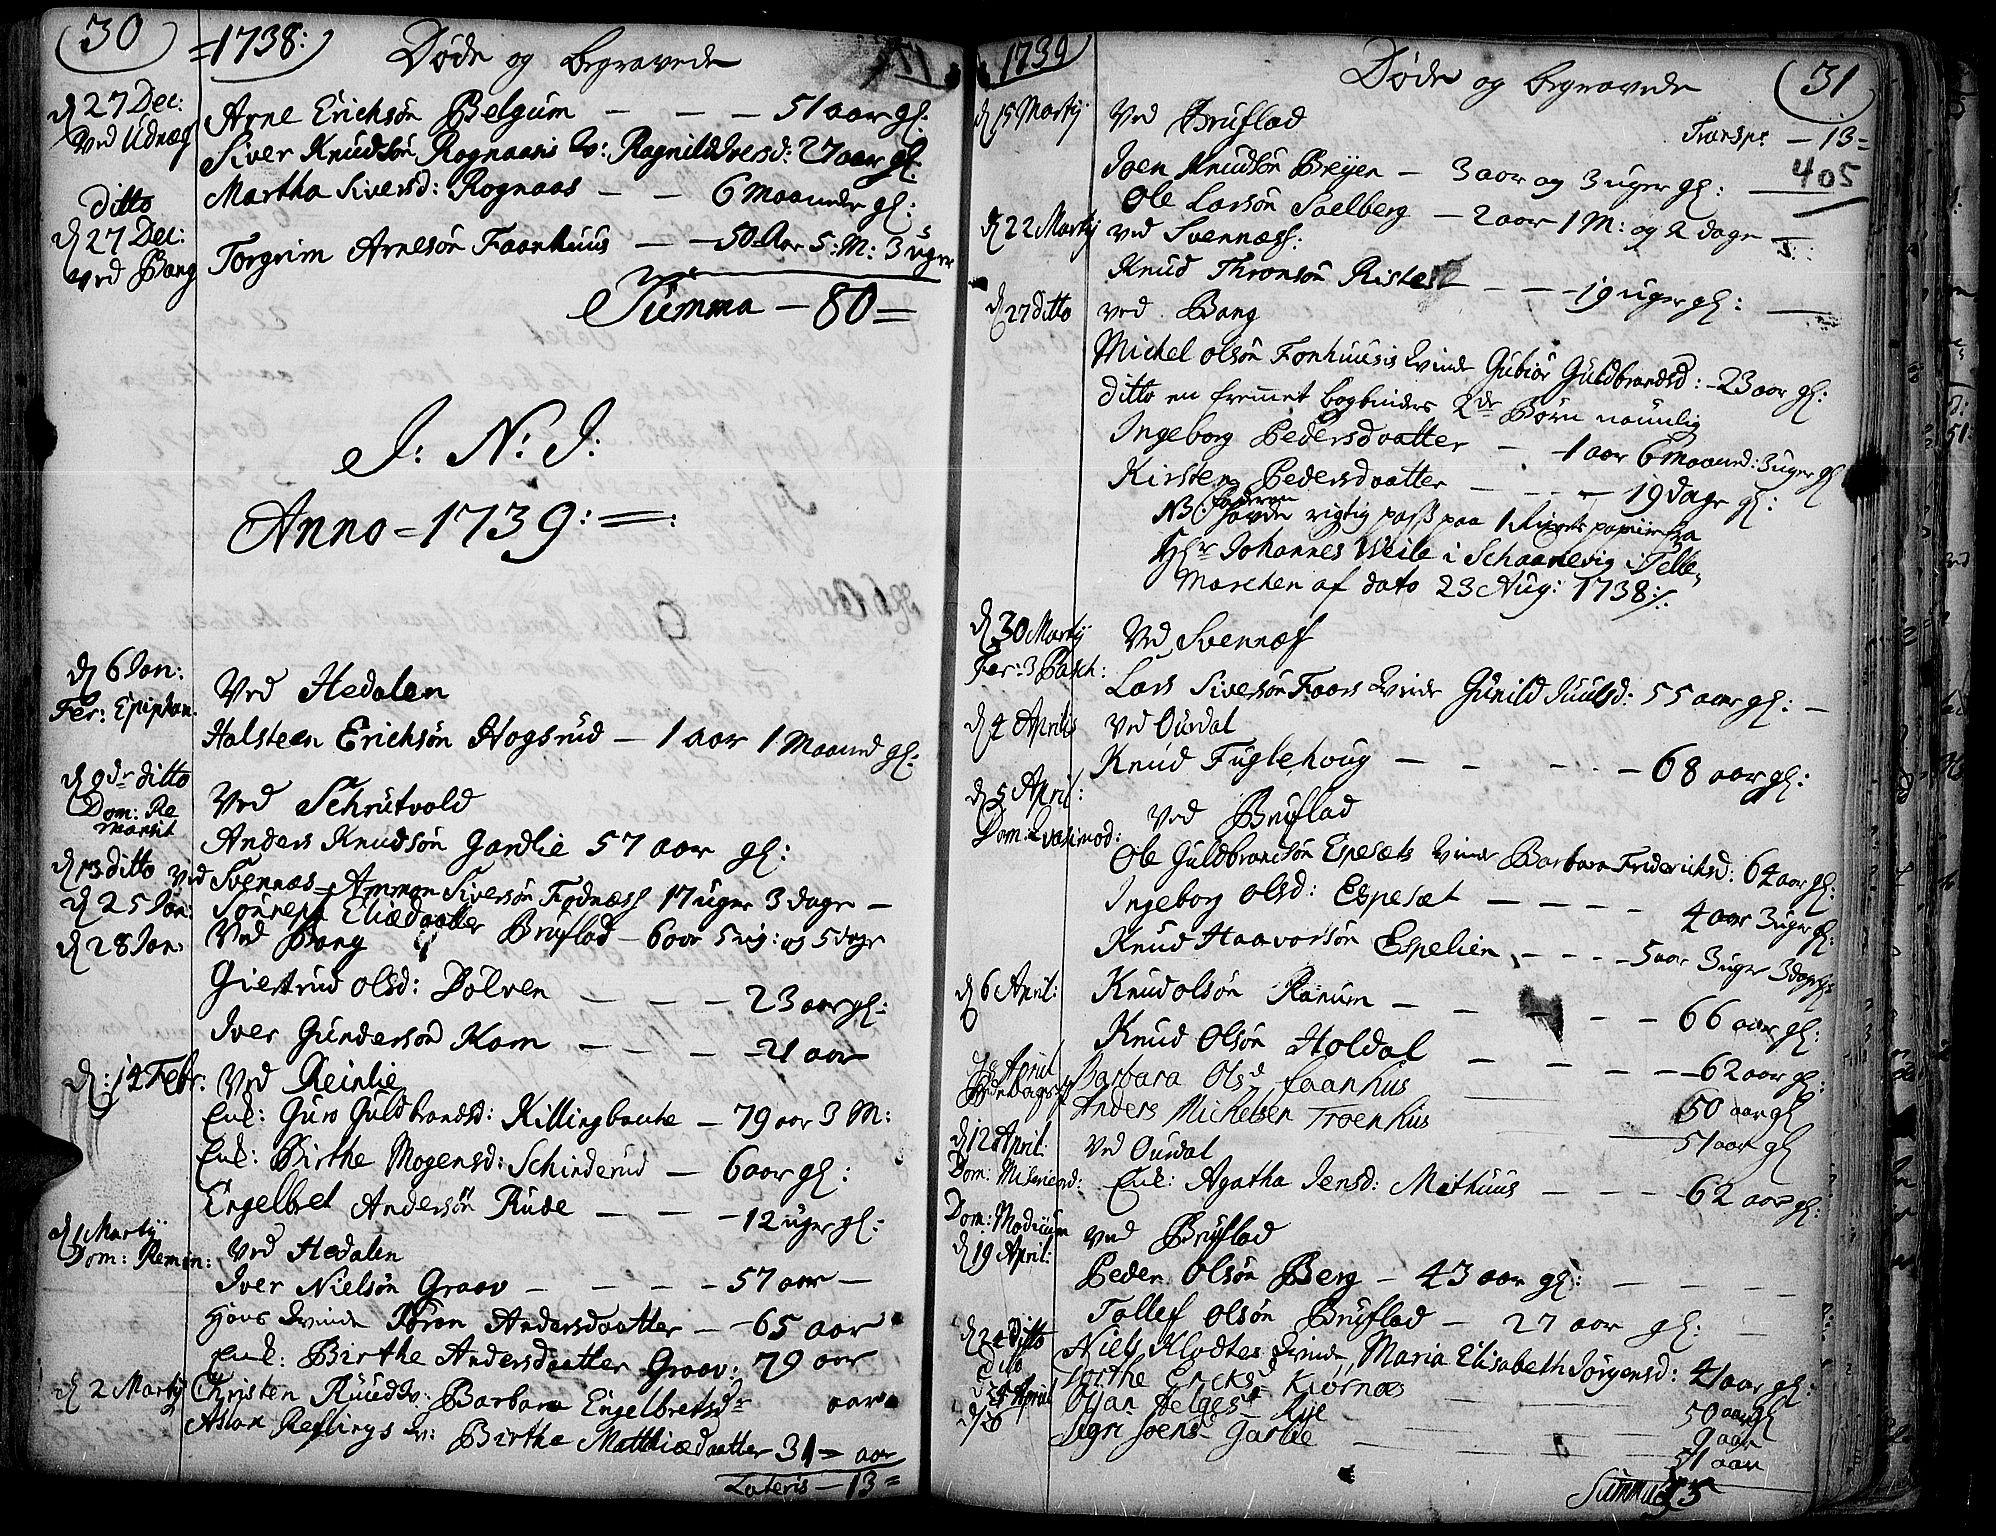 SAH, Aurdal prestekontor, Ministerialbok nr. 4, 1730-1762, s. 30-31